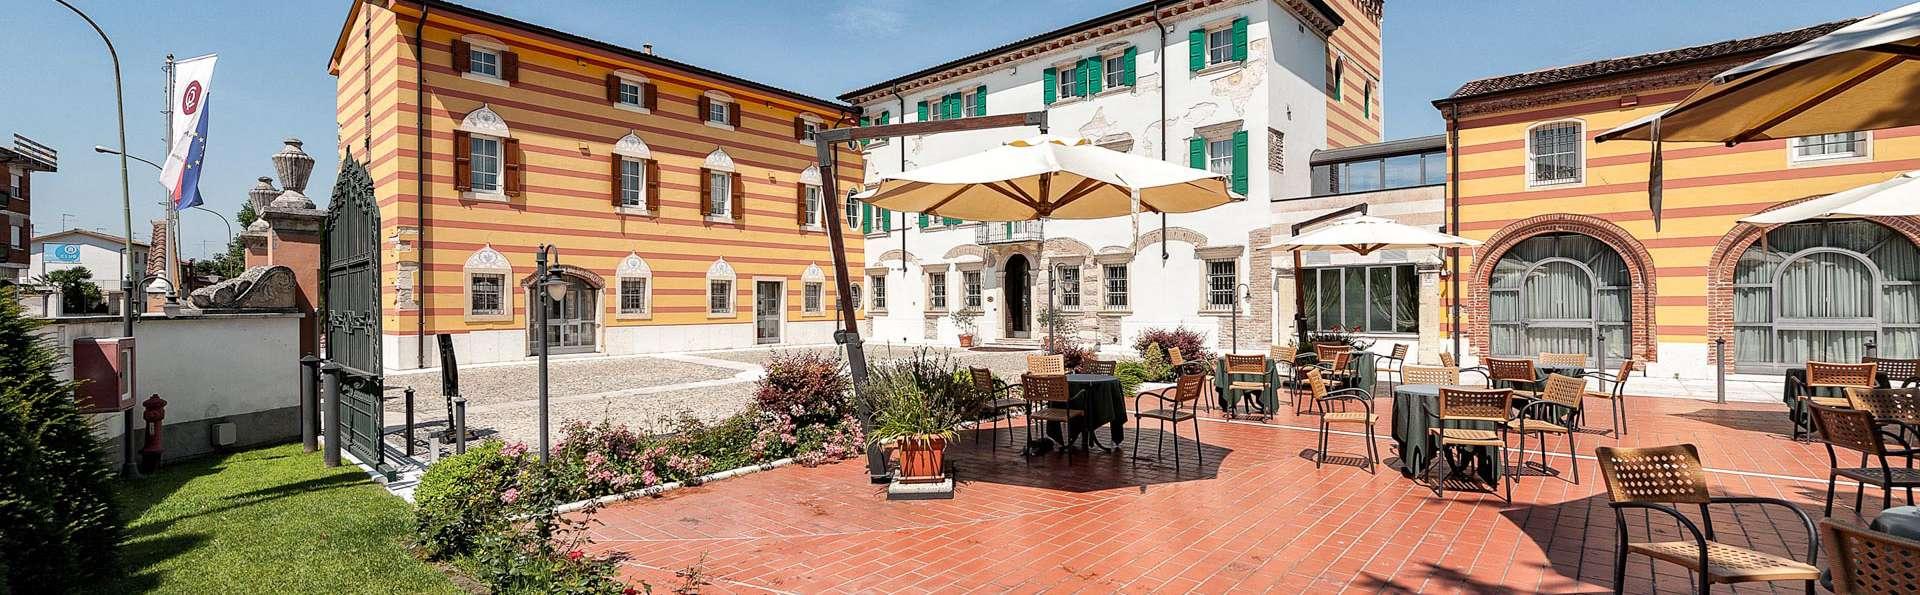 Hotel Villa Malaspina - EDIT_TERRACE_07.jpg